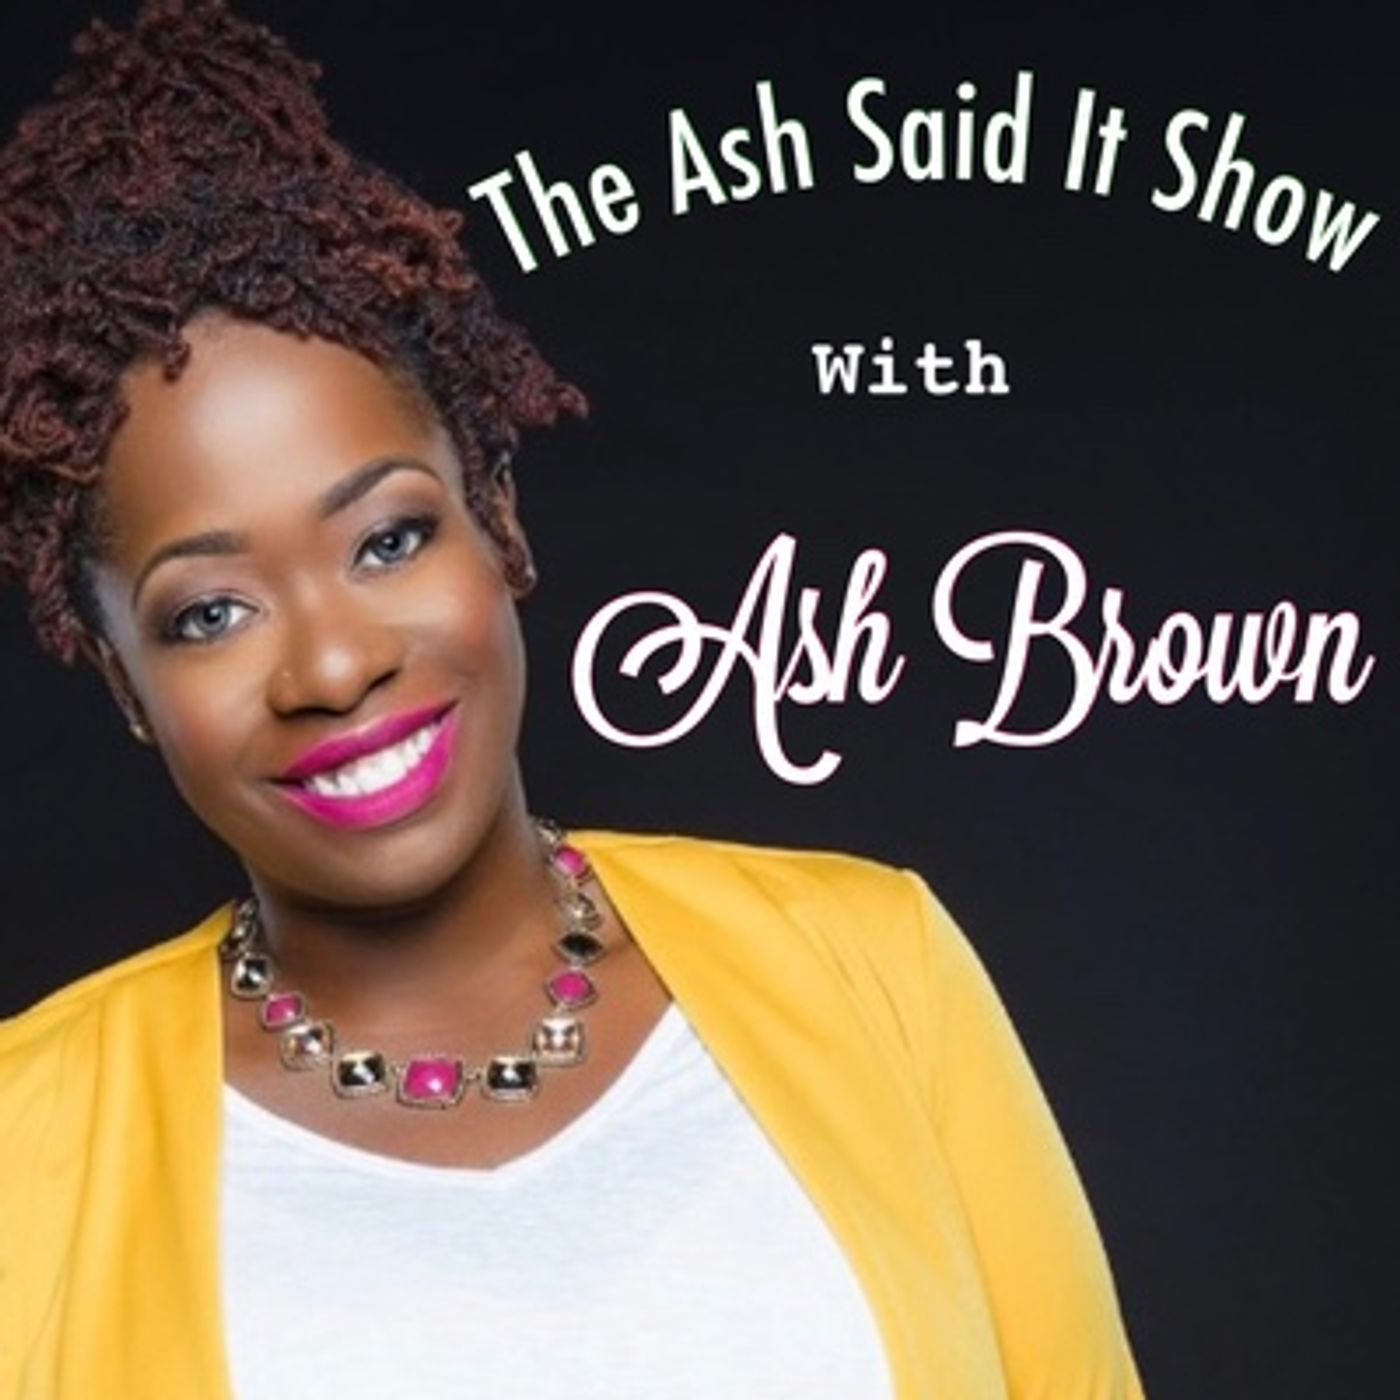 The Ash Said It Show Official Trailer